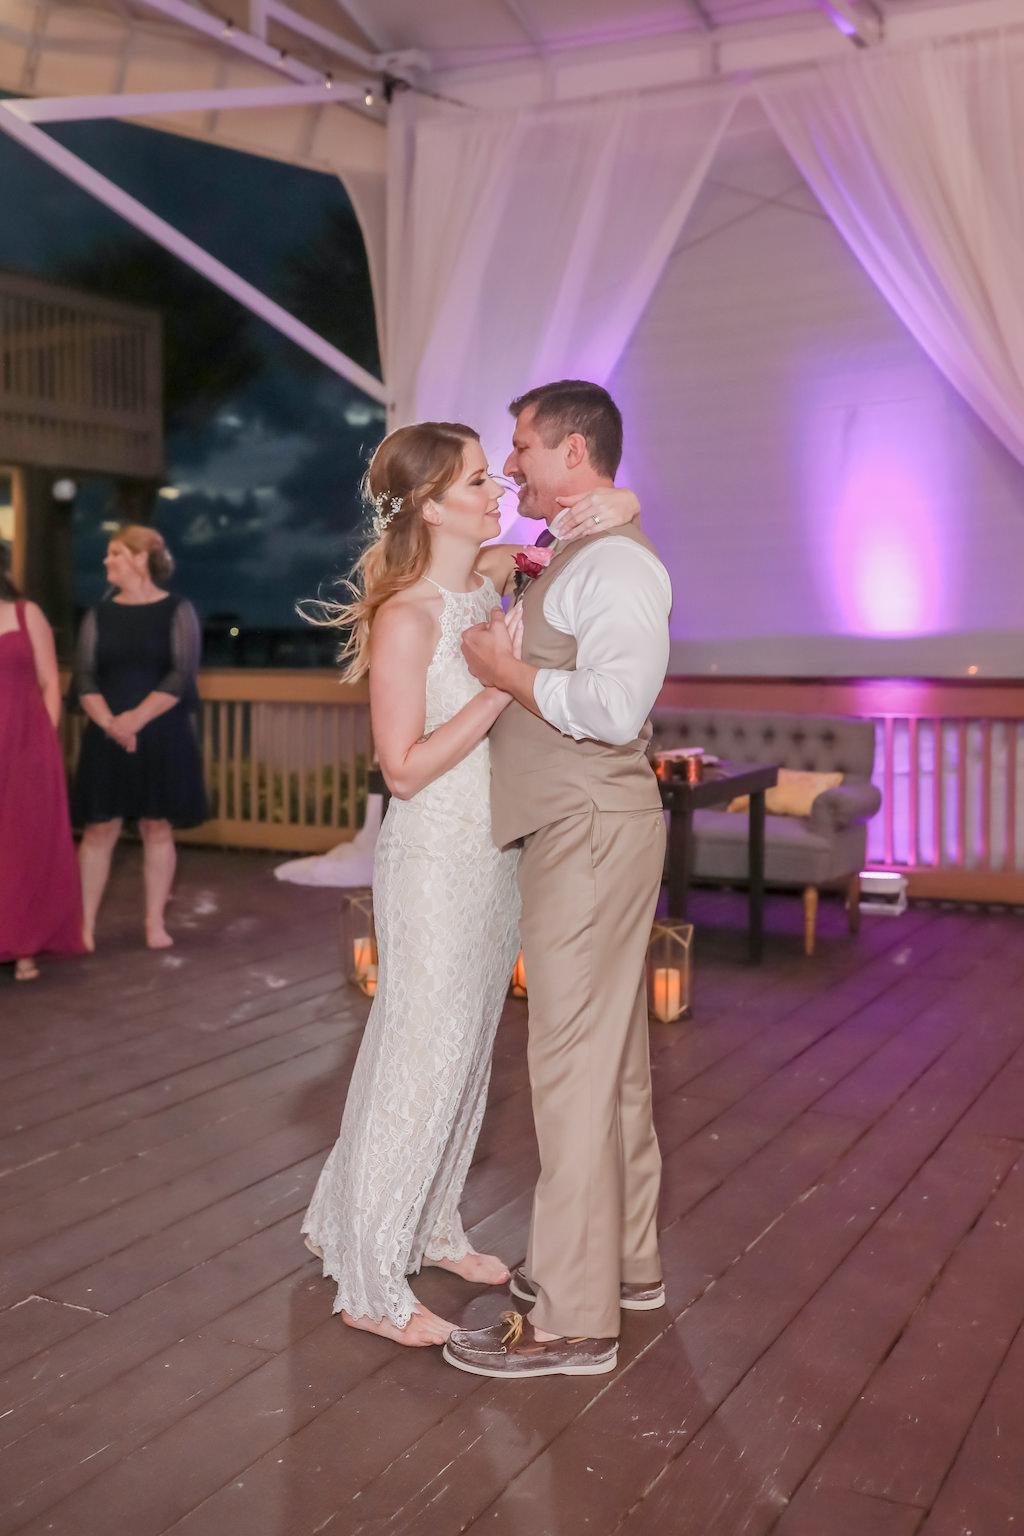 Florida Bride and Groom First Dance Wedding Portrait | Tampa Bay Wedding Photographer Lifelong Photography Studios | Clearwater Beach Hotel Wedding Venue Hilton Clearwater Beach